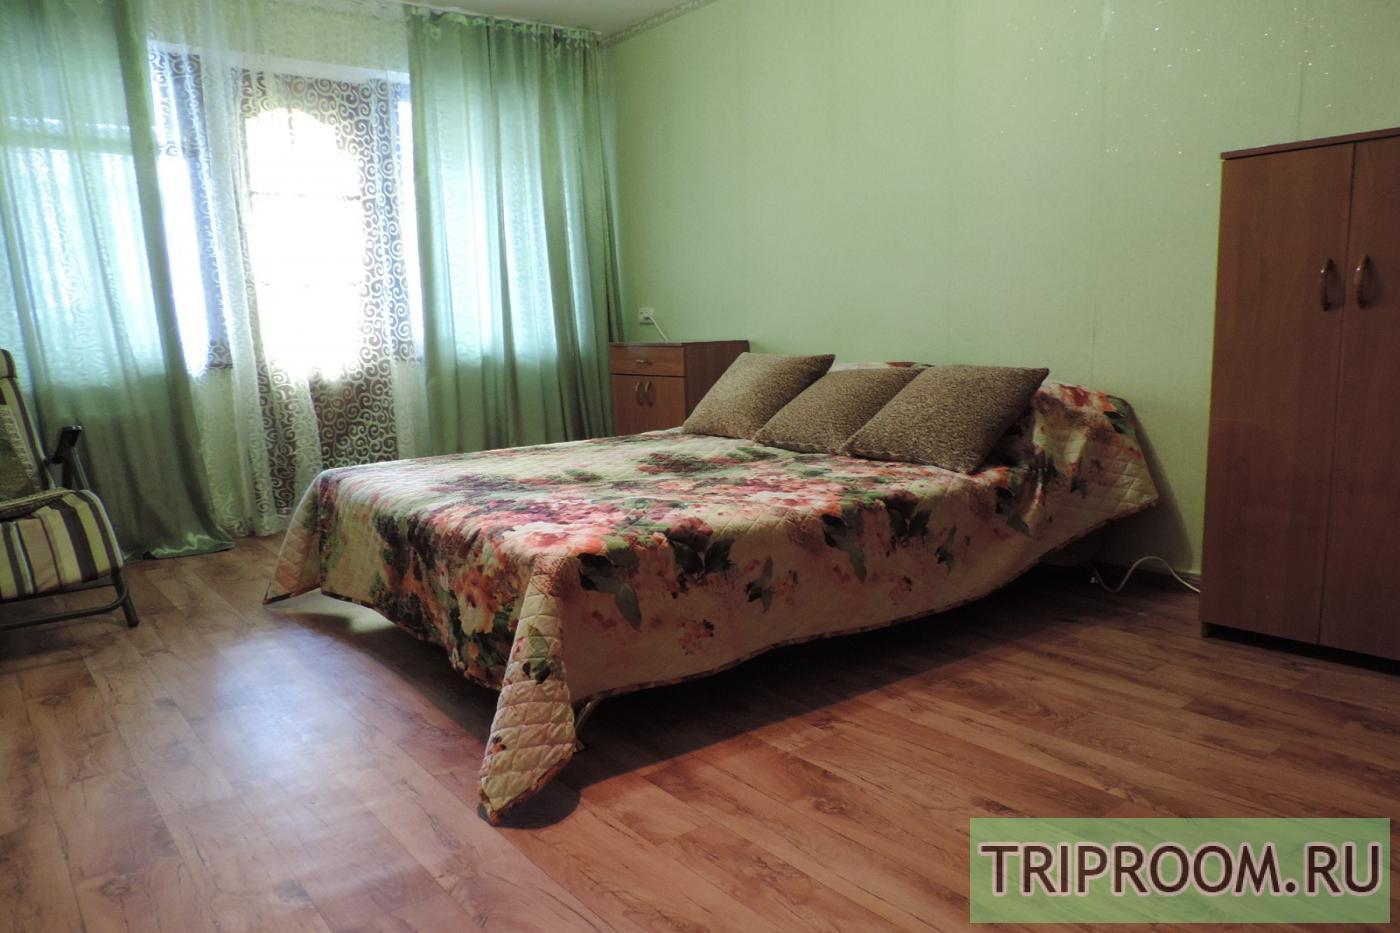 1-комнатная квартира посуточно (вариант № 734), ул. Лазарева улица, фото № 6